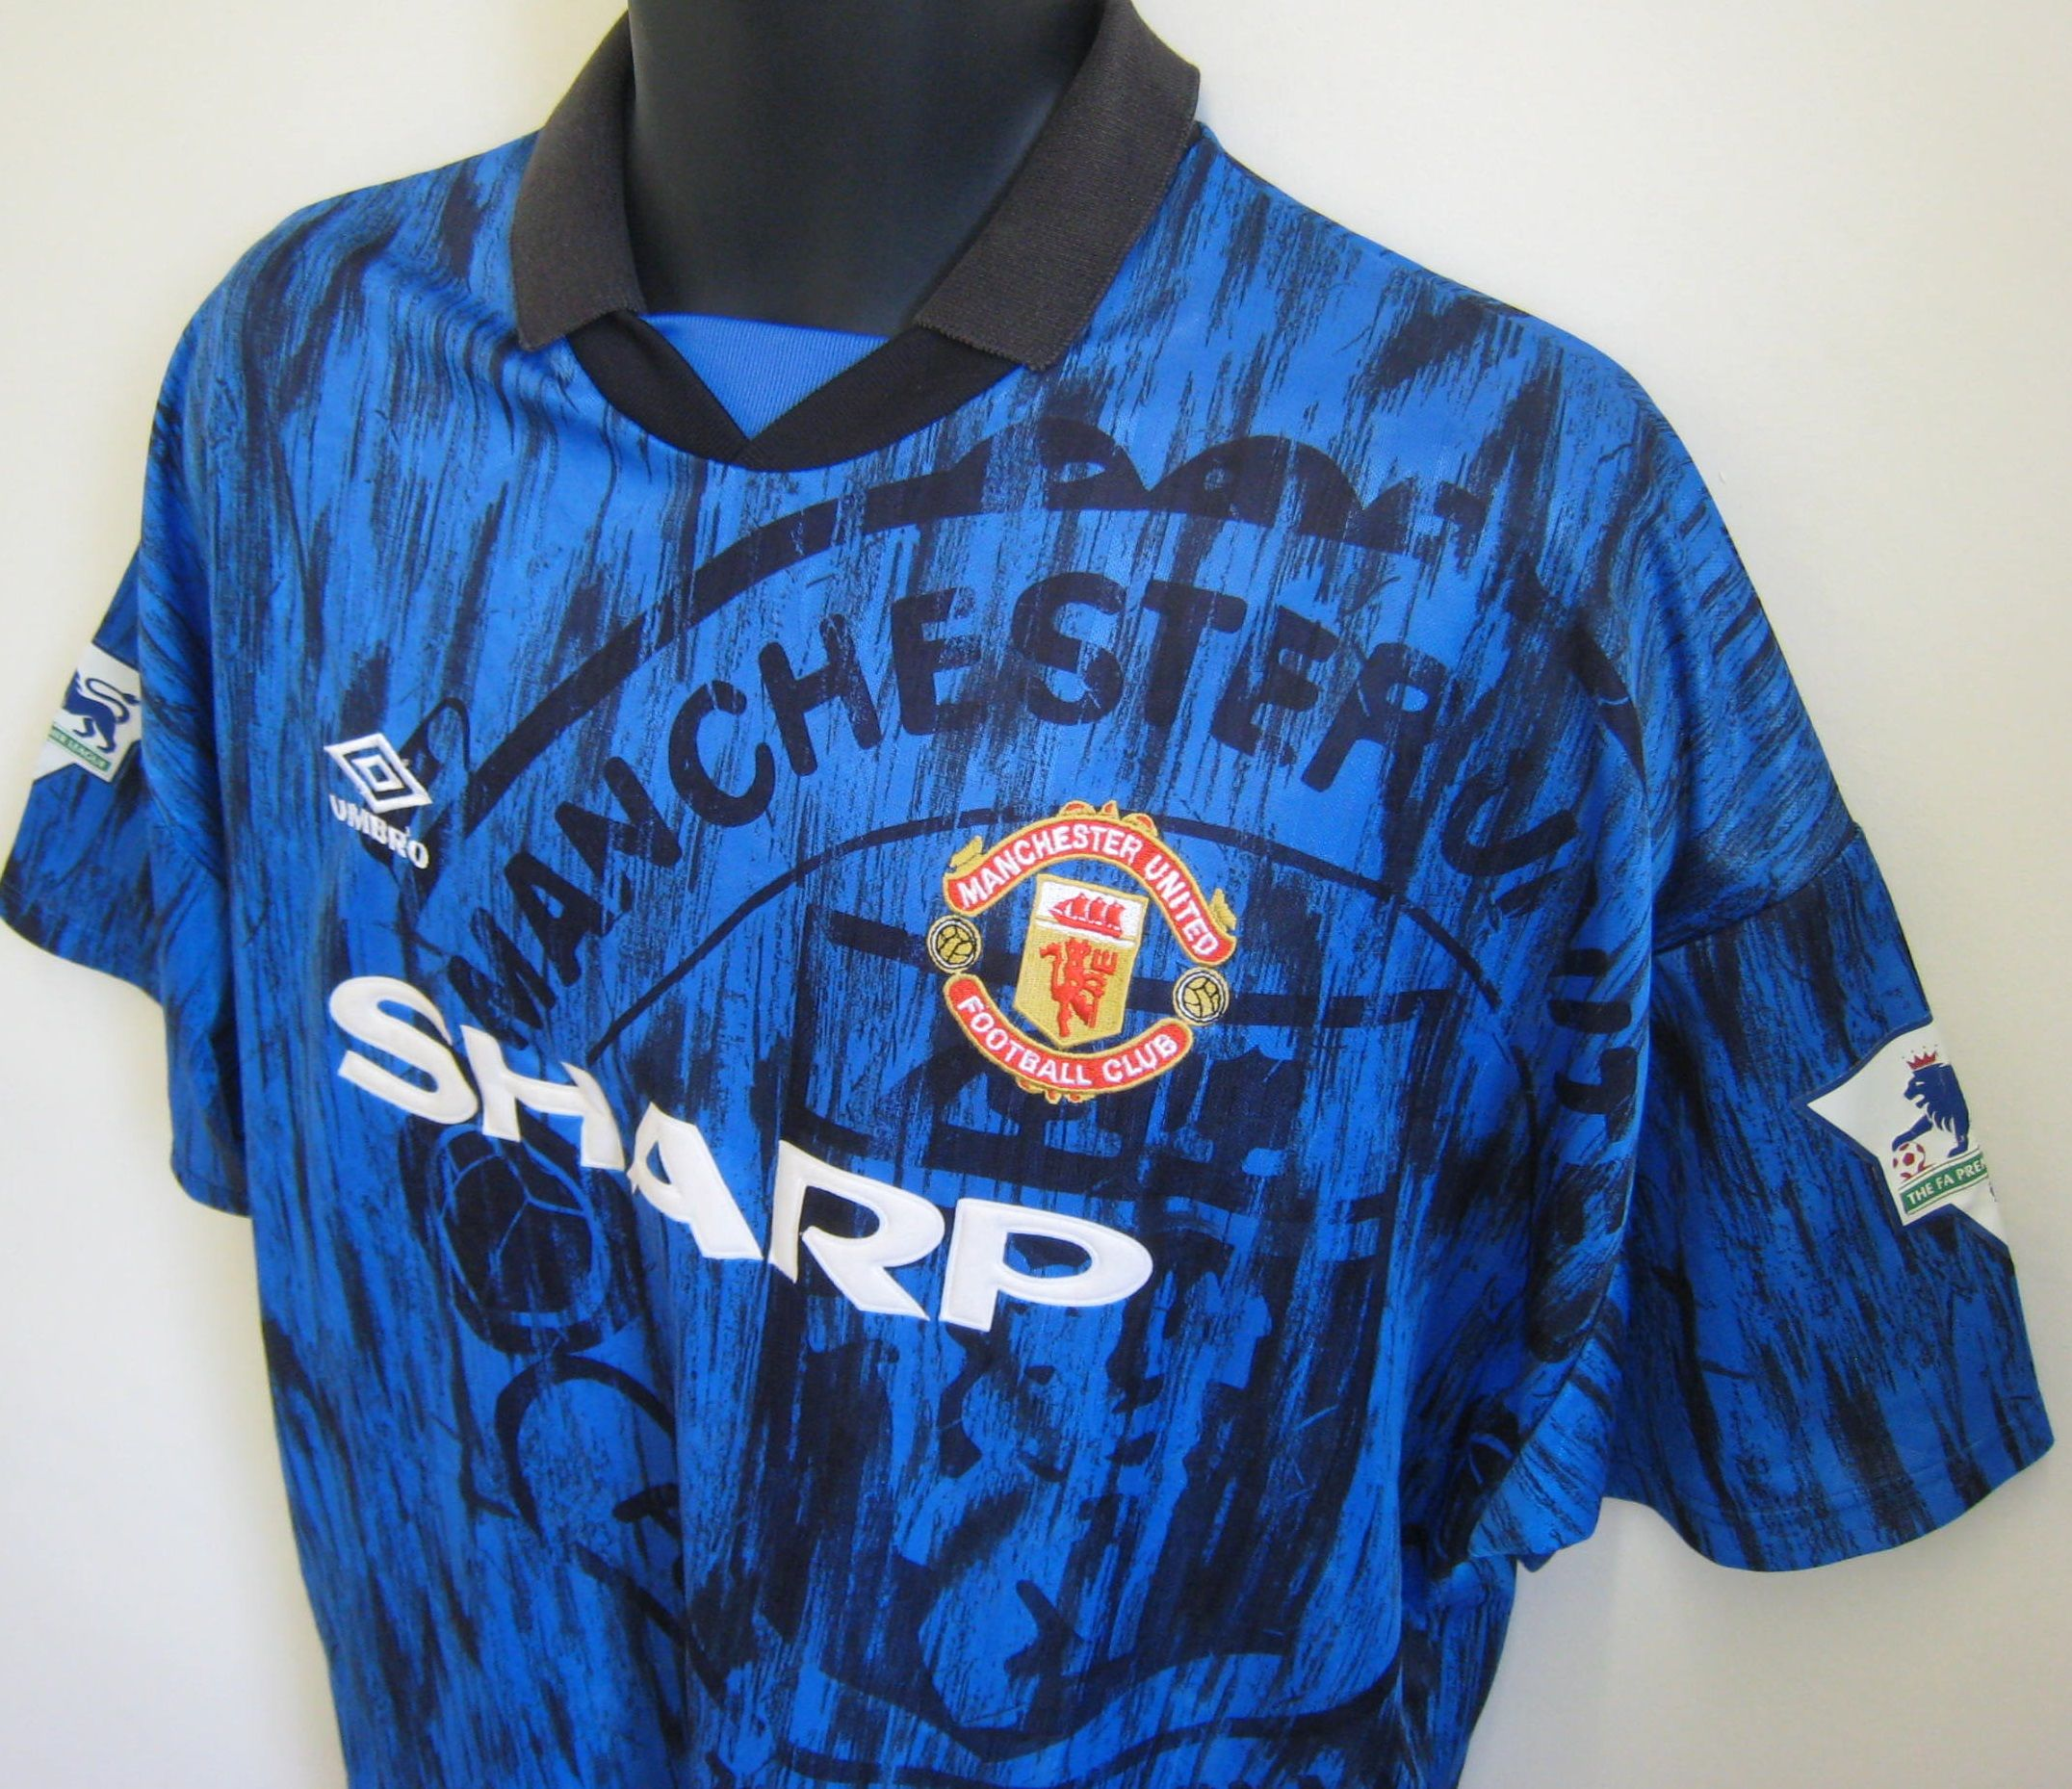 e9f65f829 1993-94 away Manchester United Premier League shirt by Umbro ...